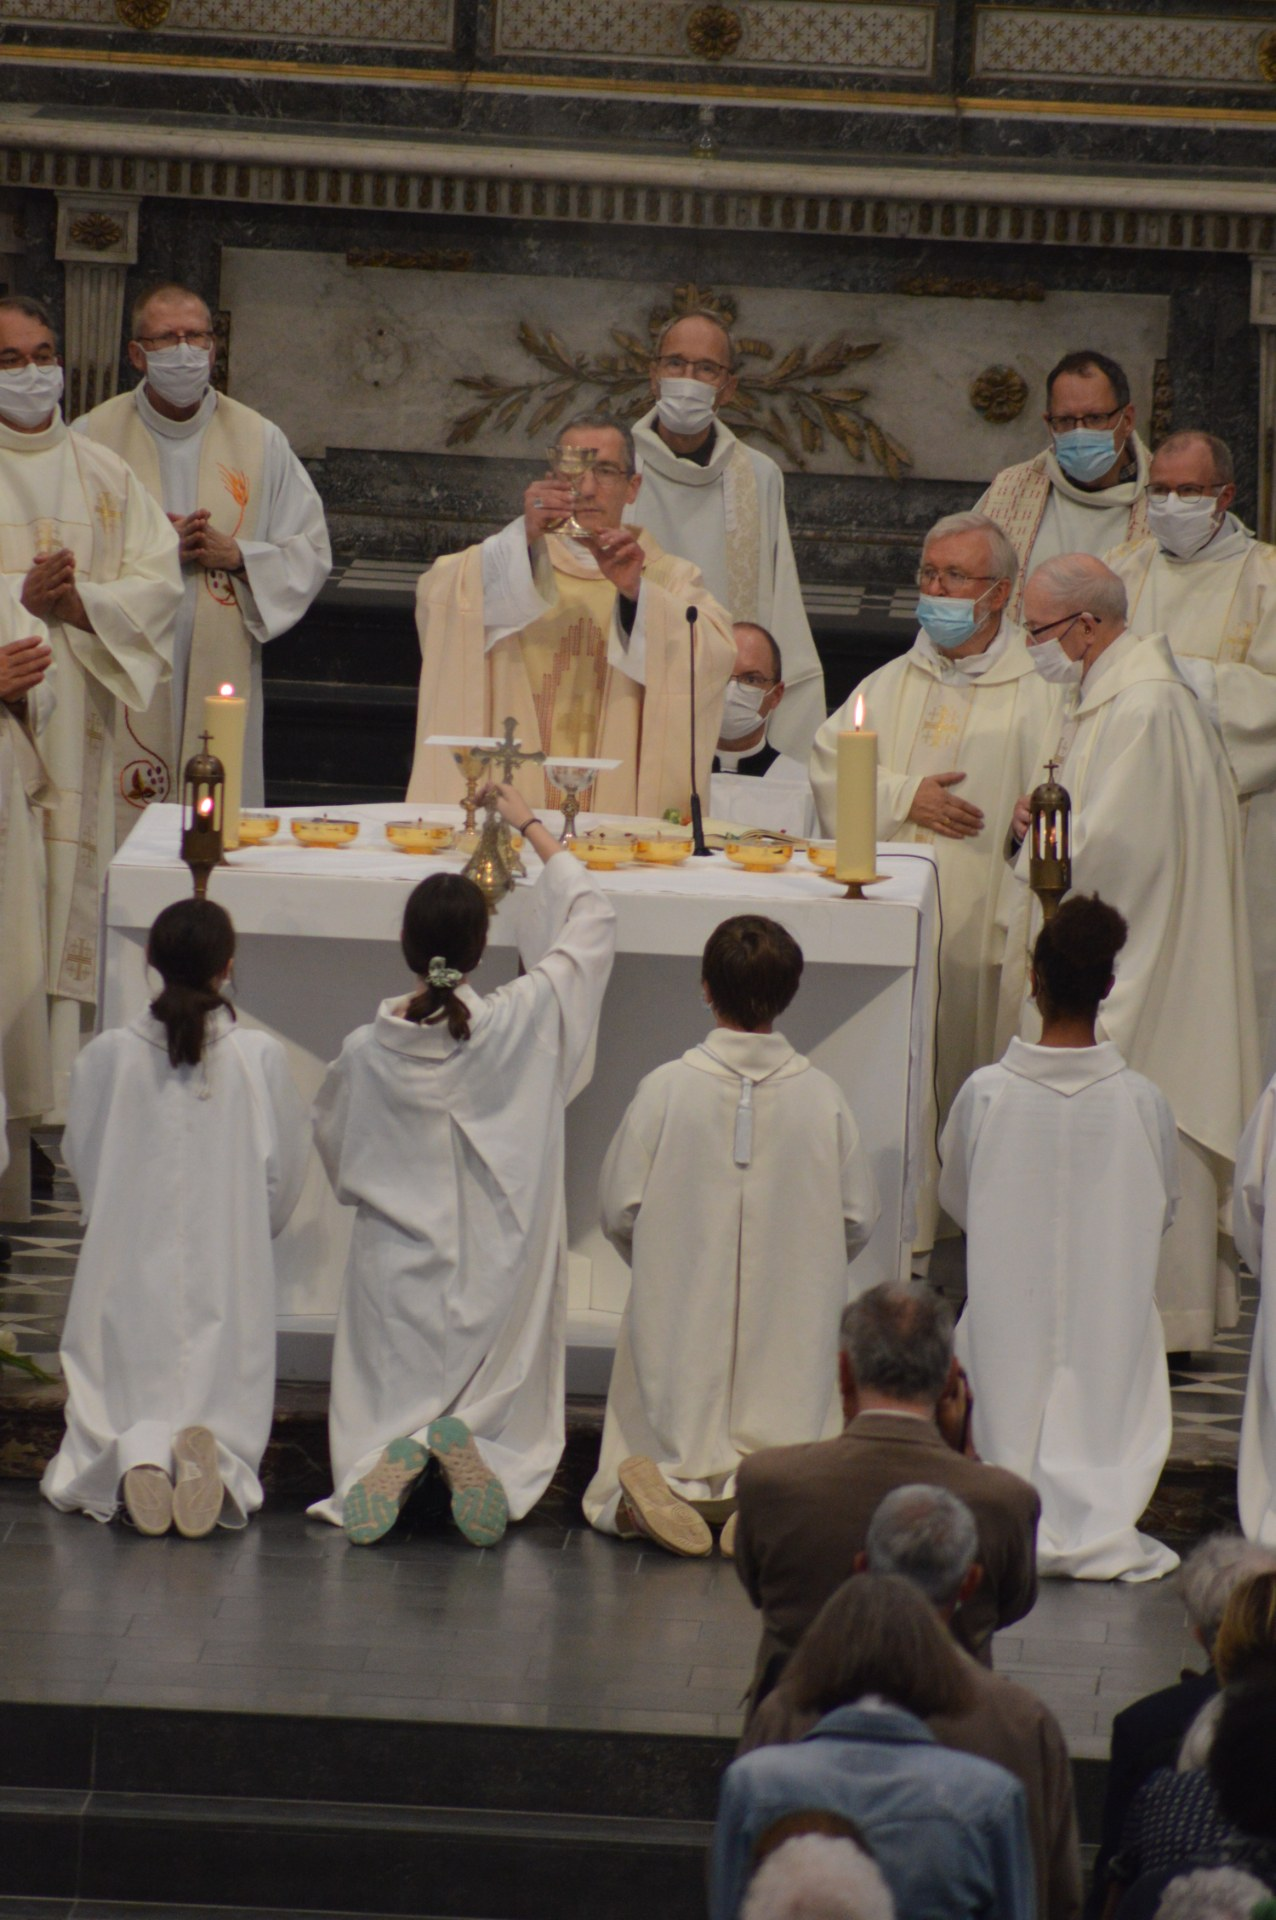 église st martin st amand 110921 28